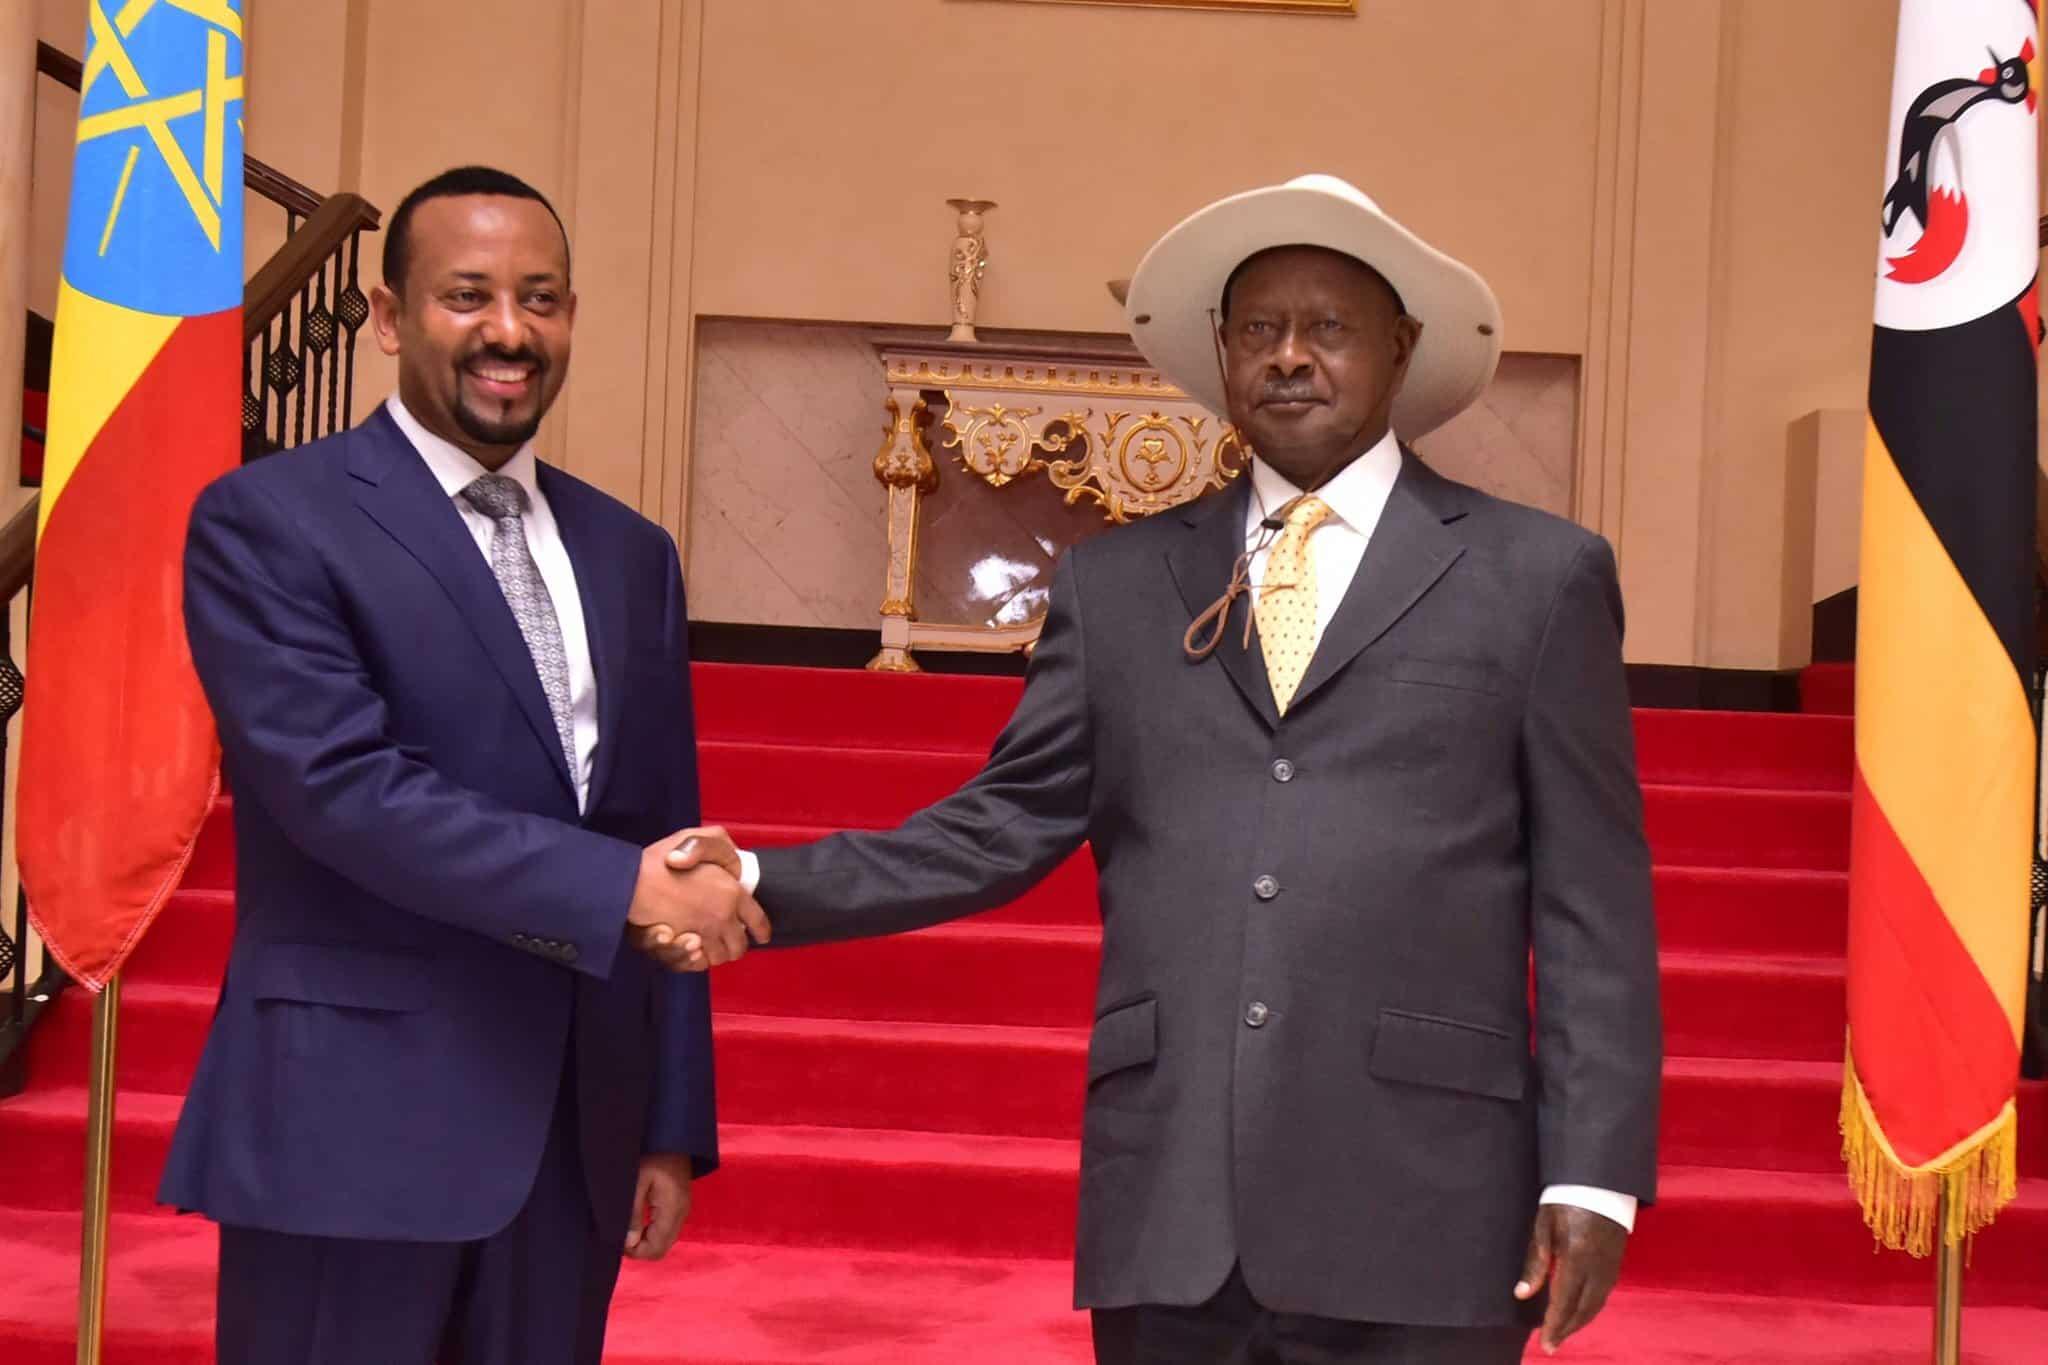 Yoweri Museveni and Abiy Ahmed. Source: Twitter.com/kagutamuseveni